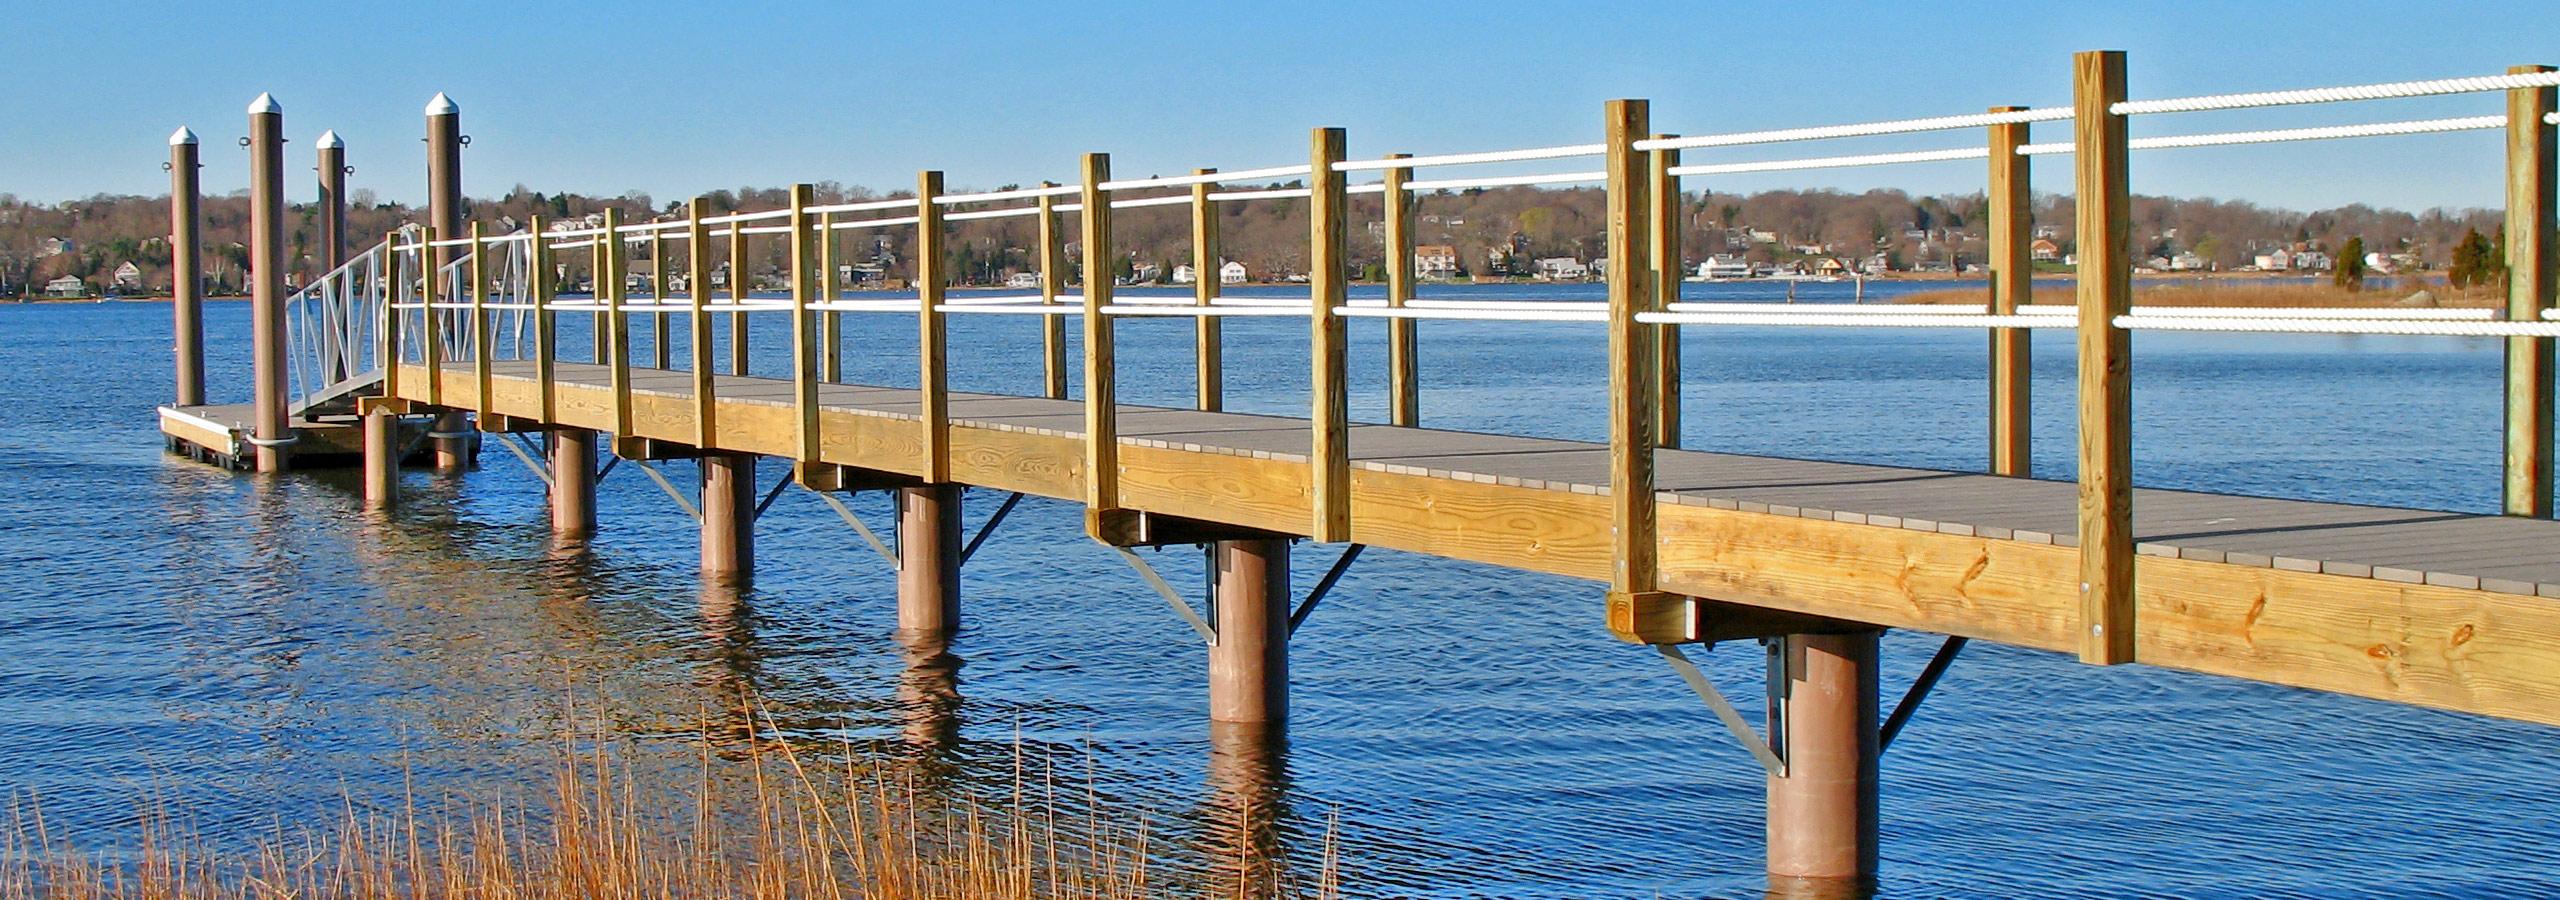 Fiberglass Composite Dock and Pier Pilings | Pearson Pilings